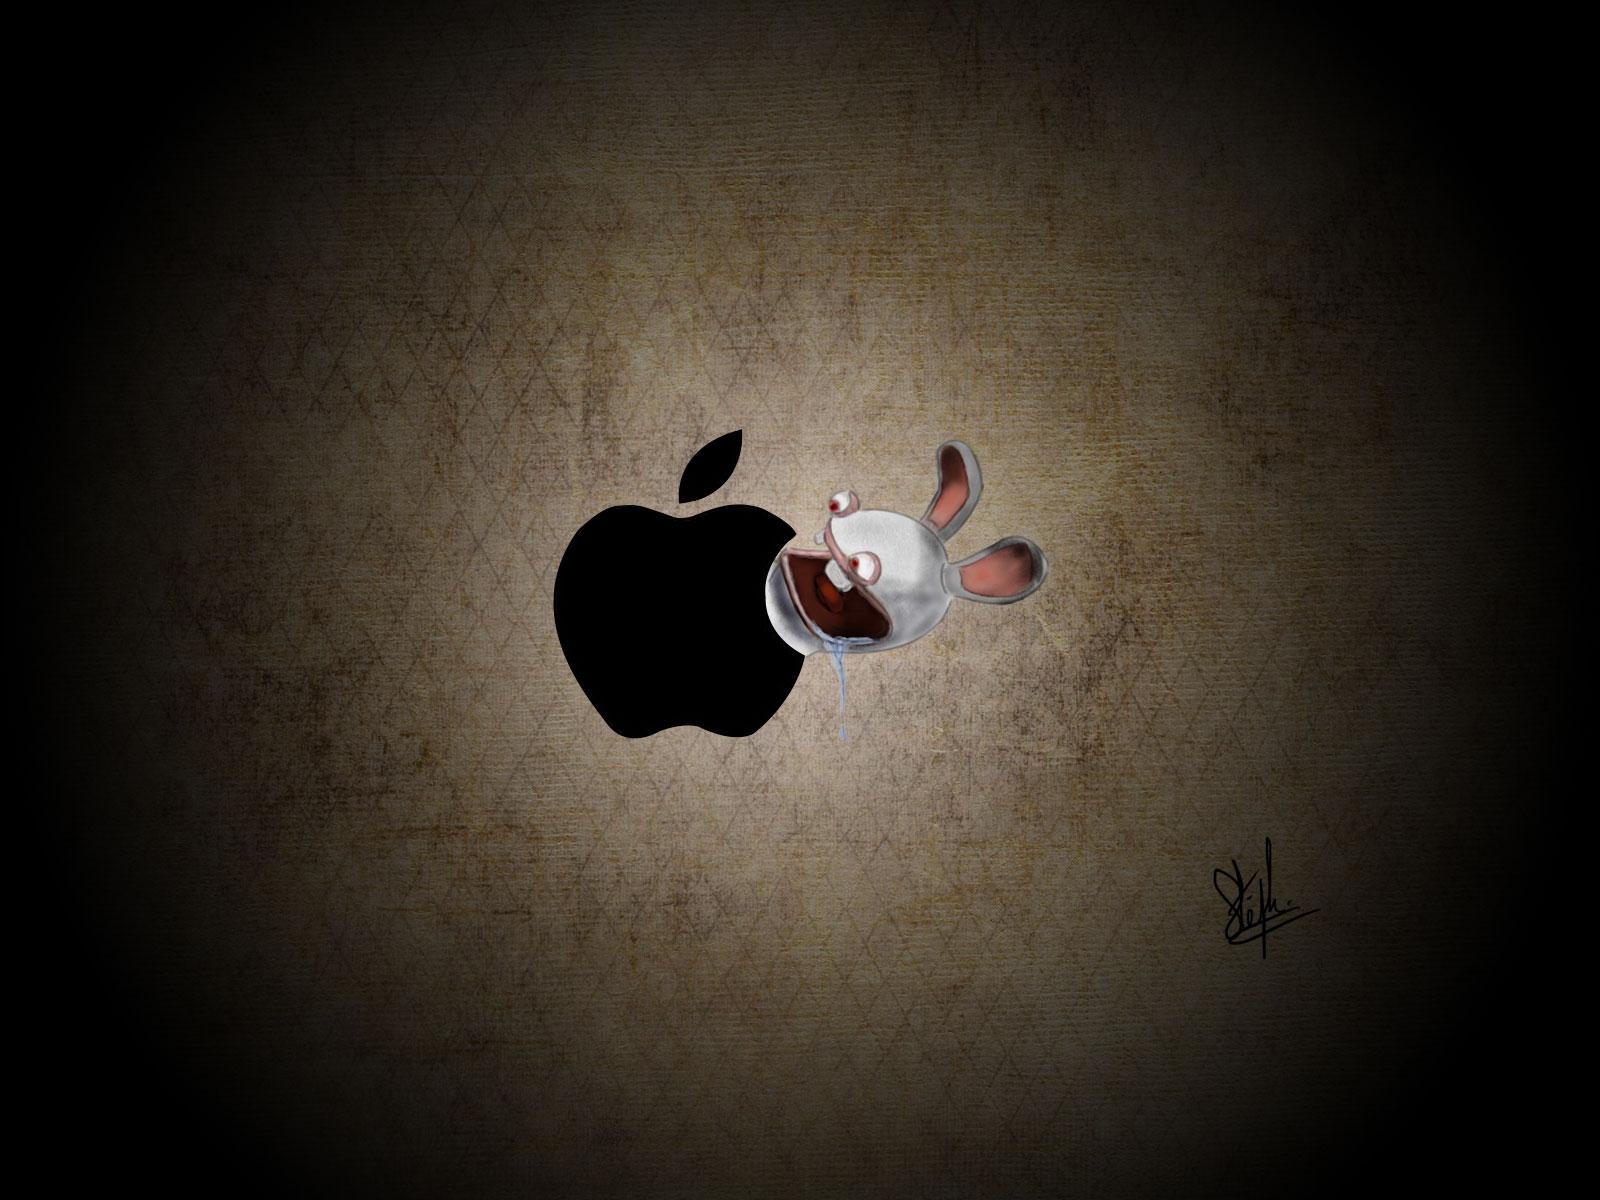 Fond d 39 ecran lapin cr tin apple wallpaper - Lapin cretain gratuit ...